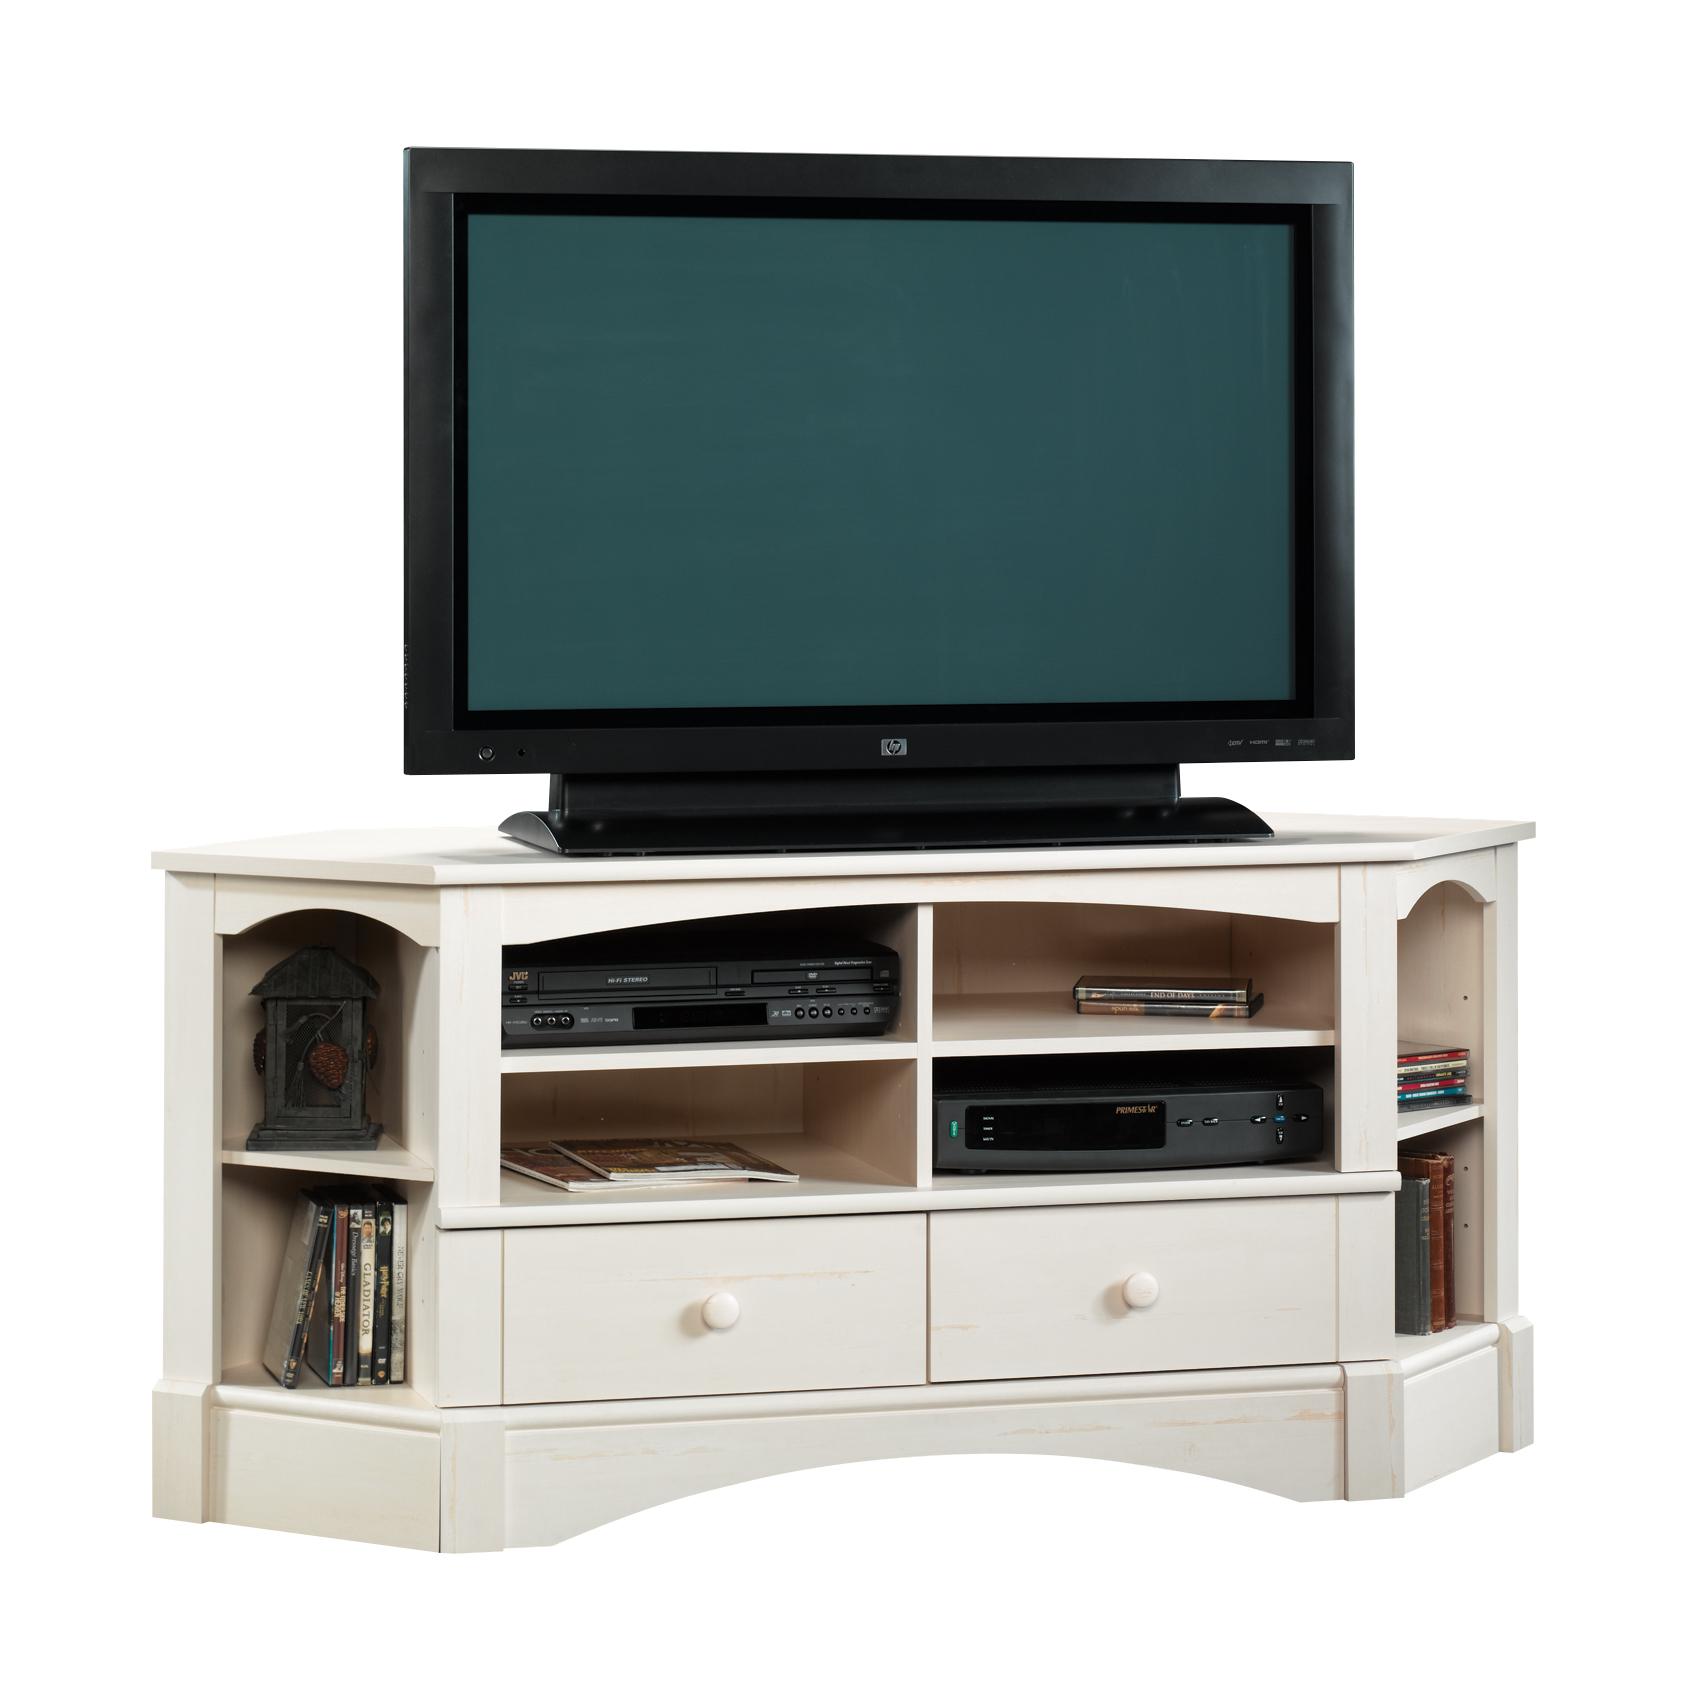 "Sauder Harbor View Corner Entertainment Credenza, For TVs up to 60"", Antiqued White finish $125 on Amazon/Walmart"